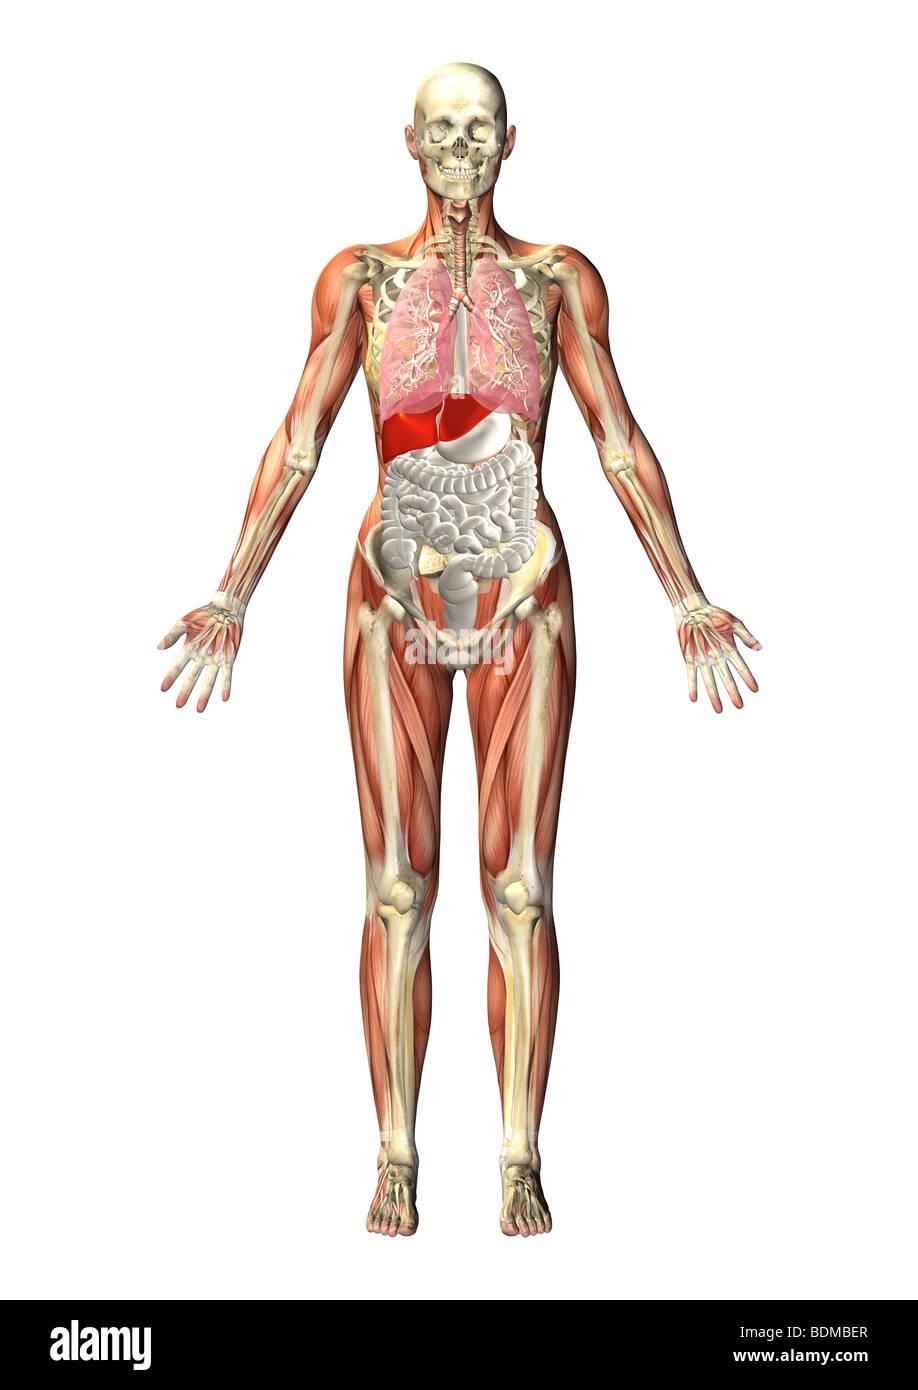 Human Anatomy Illustration Showing Stock Photo 25648975 Alamy